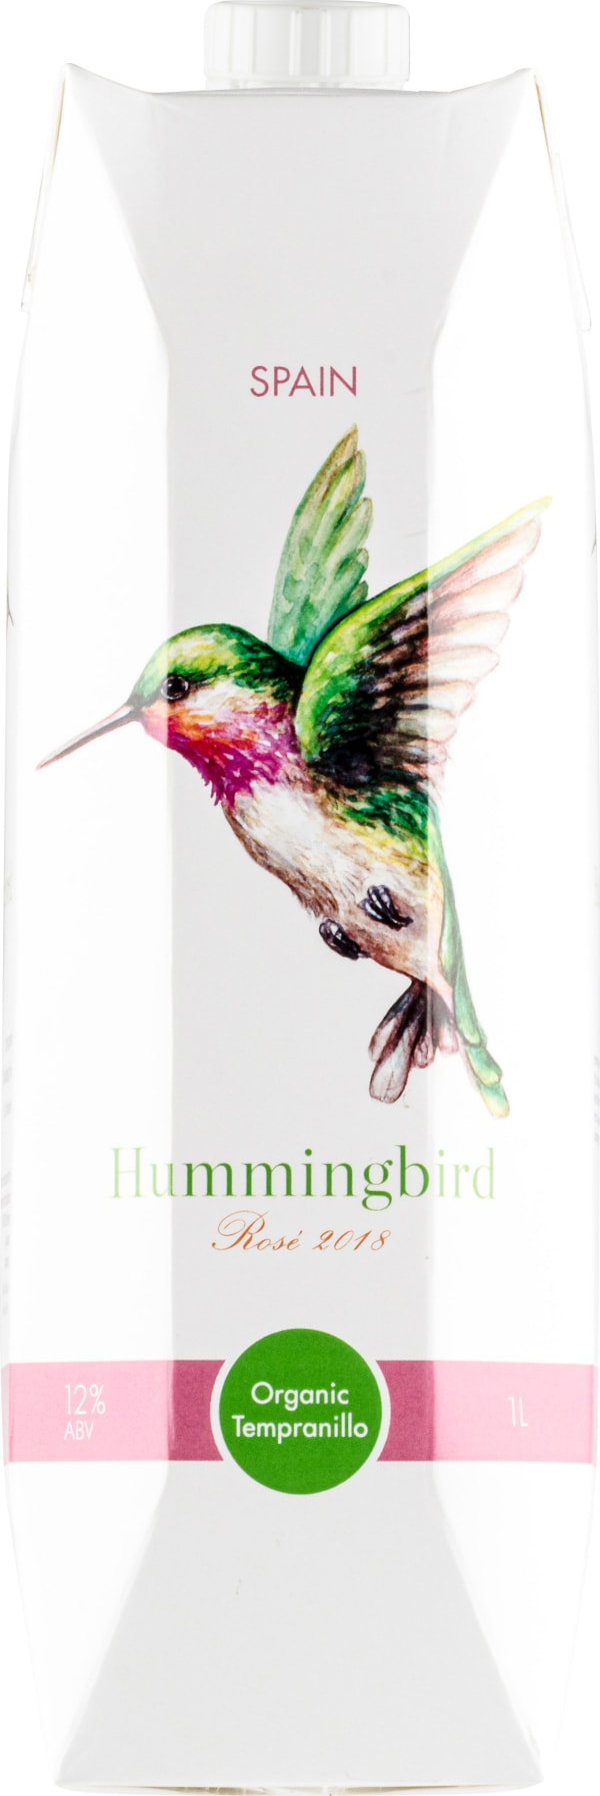 Hummingbird Organic Tempranillo Rosé 2018 carton package